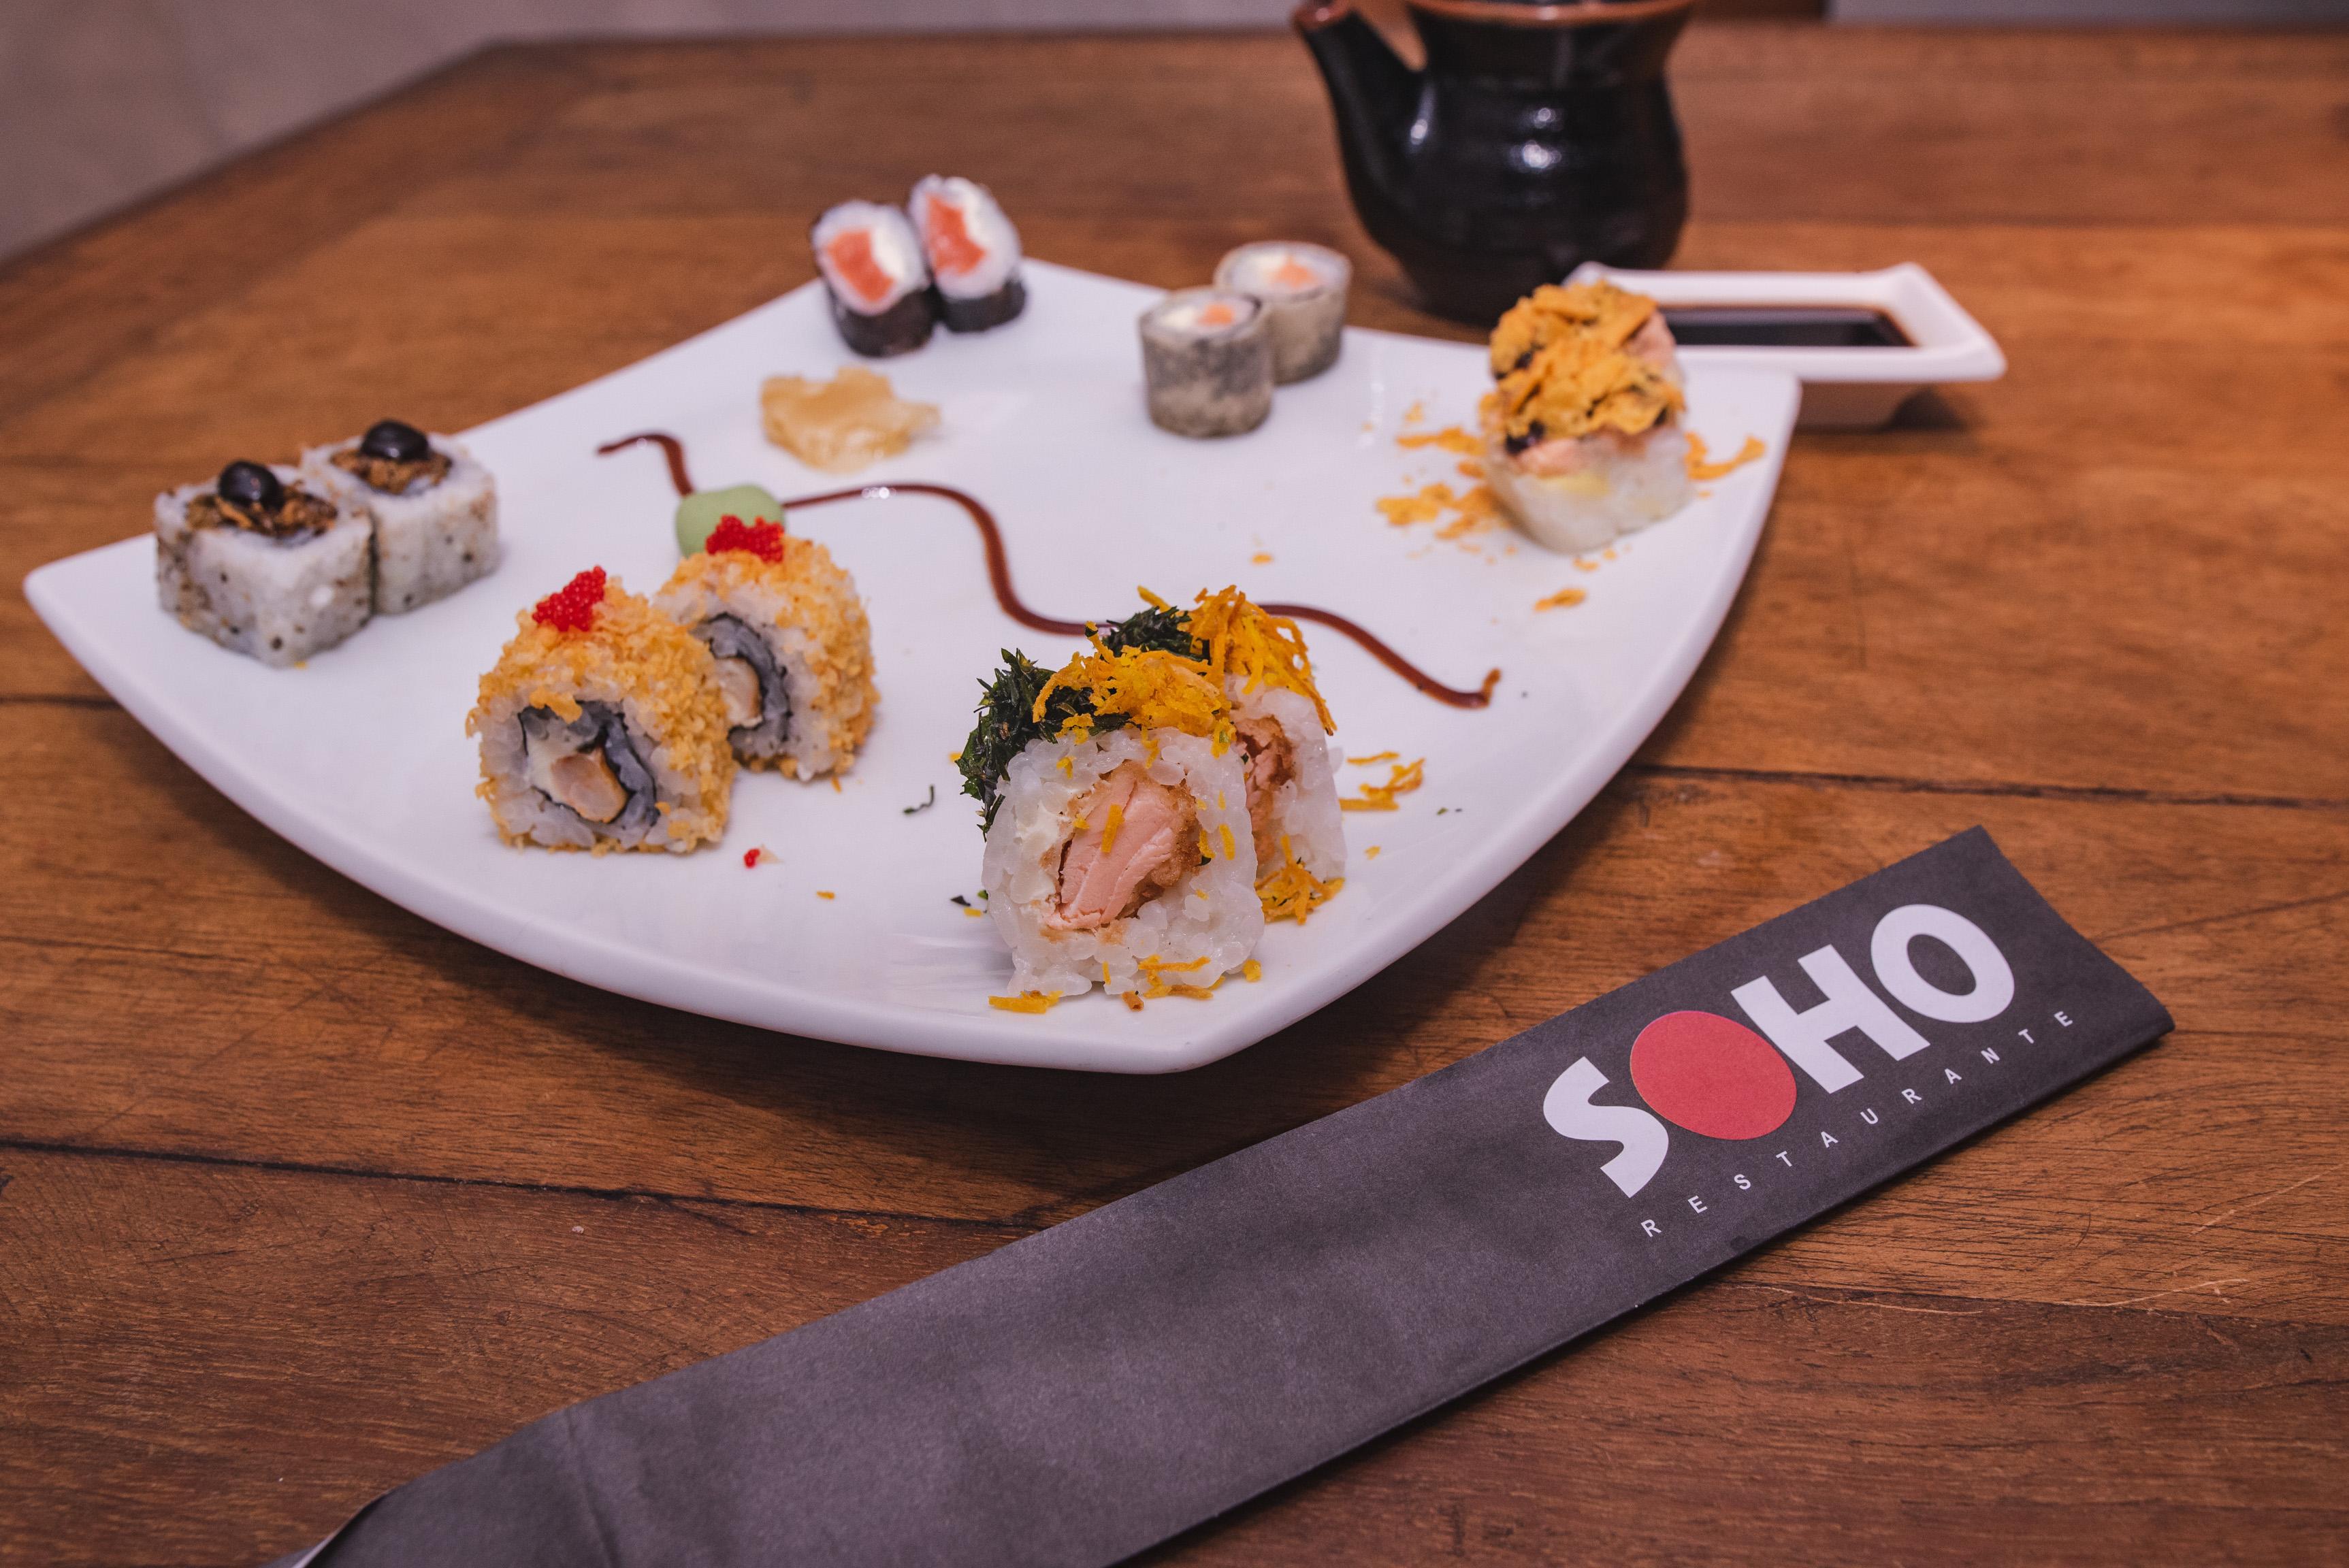 Plataformas de vendas online dos shoppings RioMar realizam promoções de combos de comidas orientais